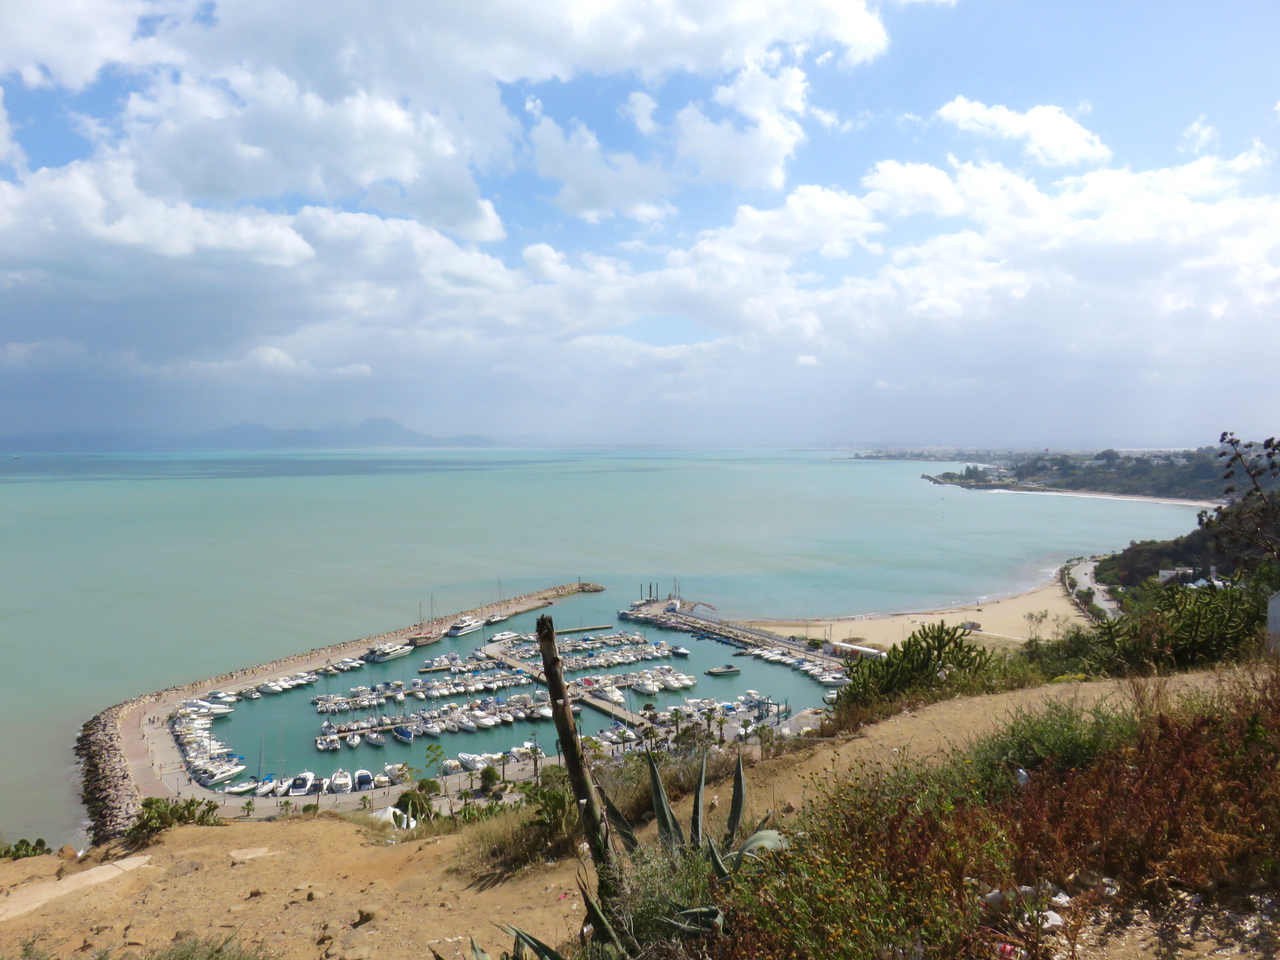 Tunisia, Sidi Bou Said, Mediterraneo